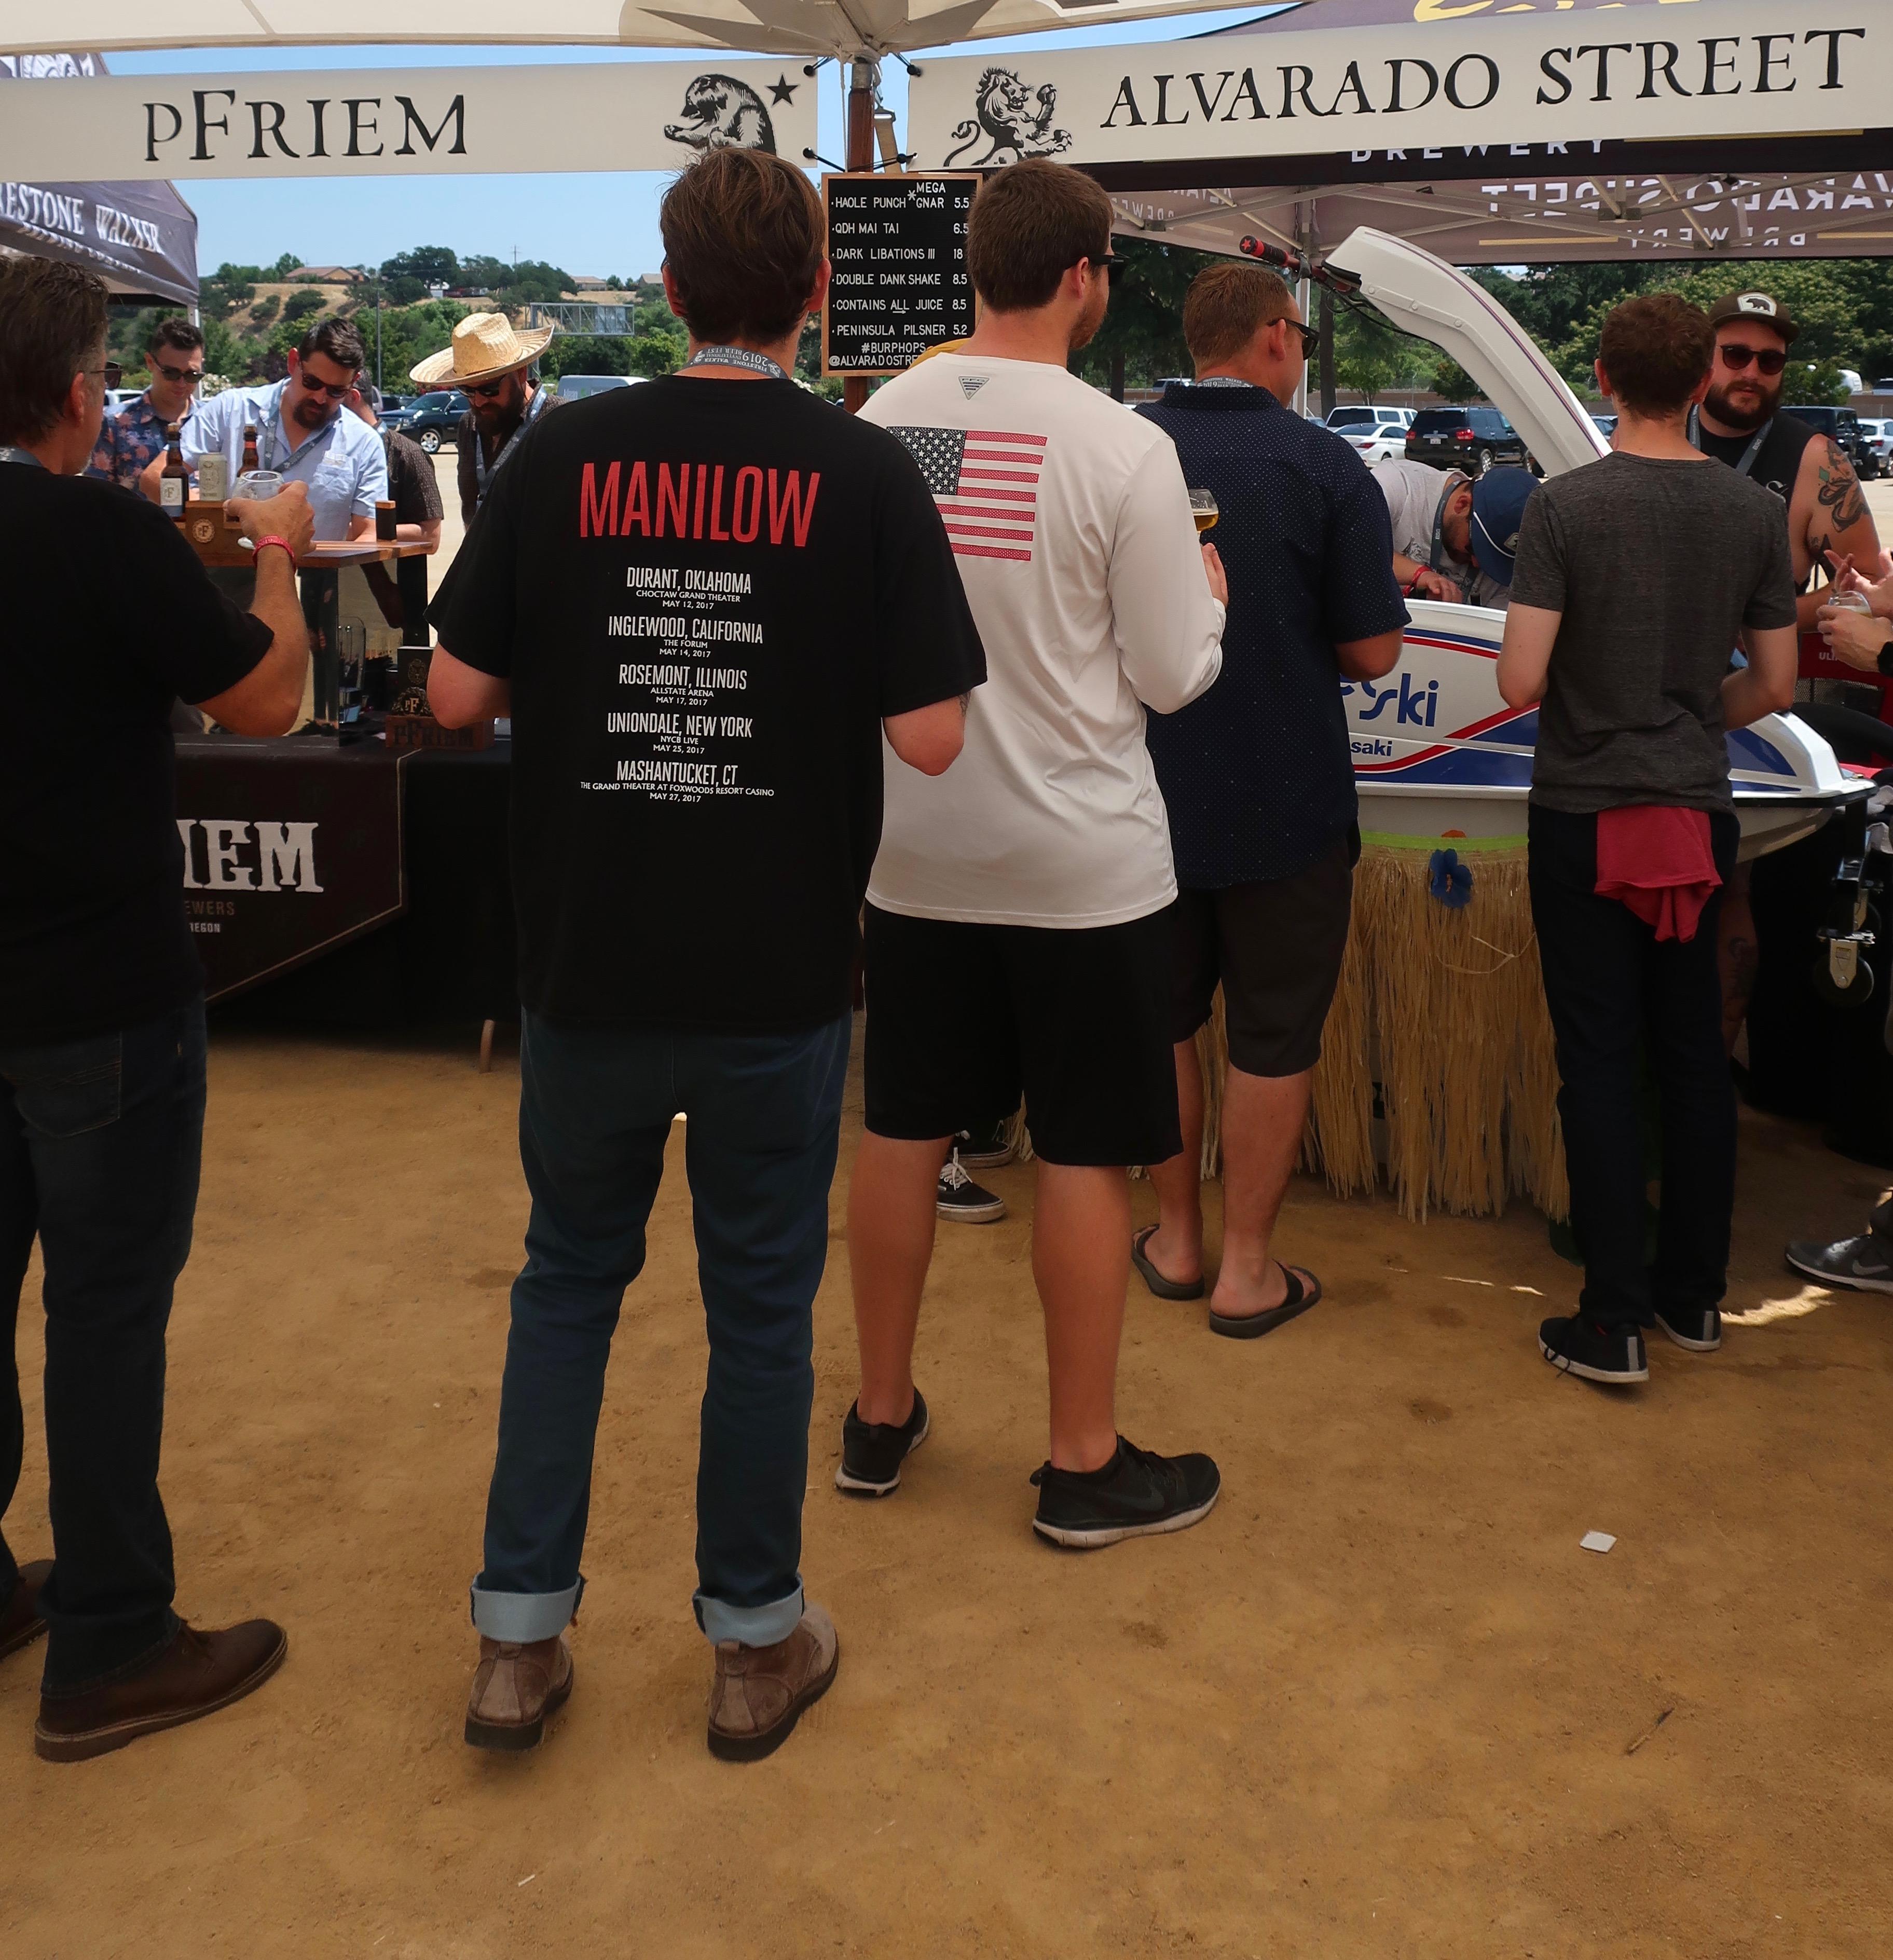 Even fans of Barry Manilow attend the 2019 Firestone Walker Invitational Beer Fest.